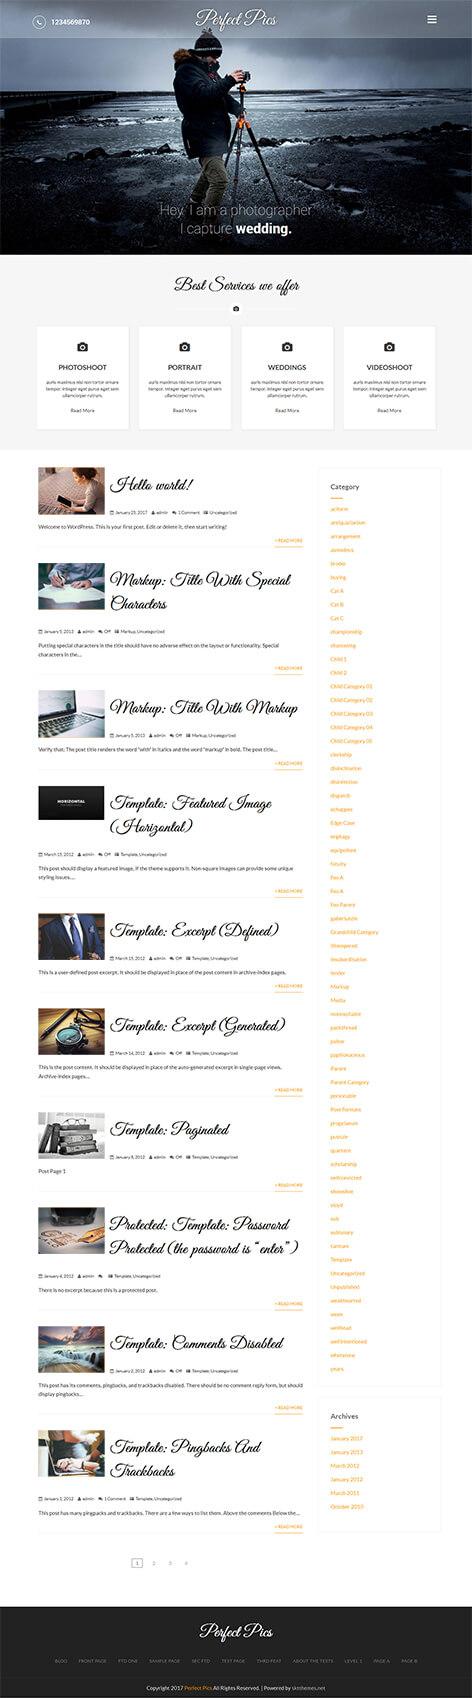 free photo gallery WordPress theme